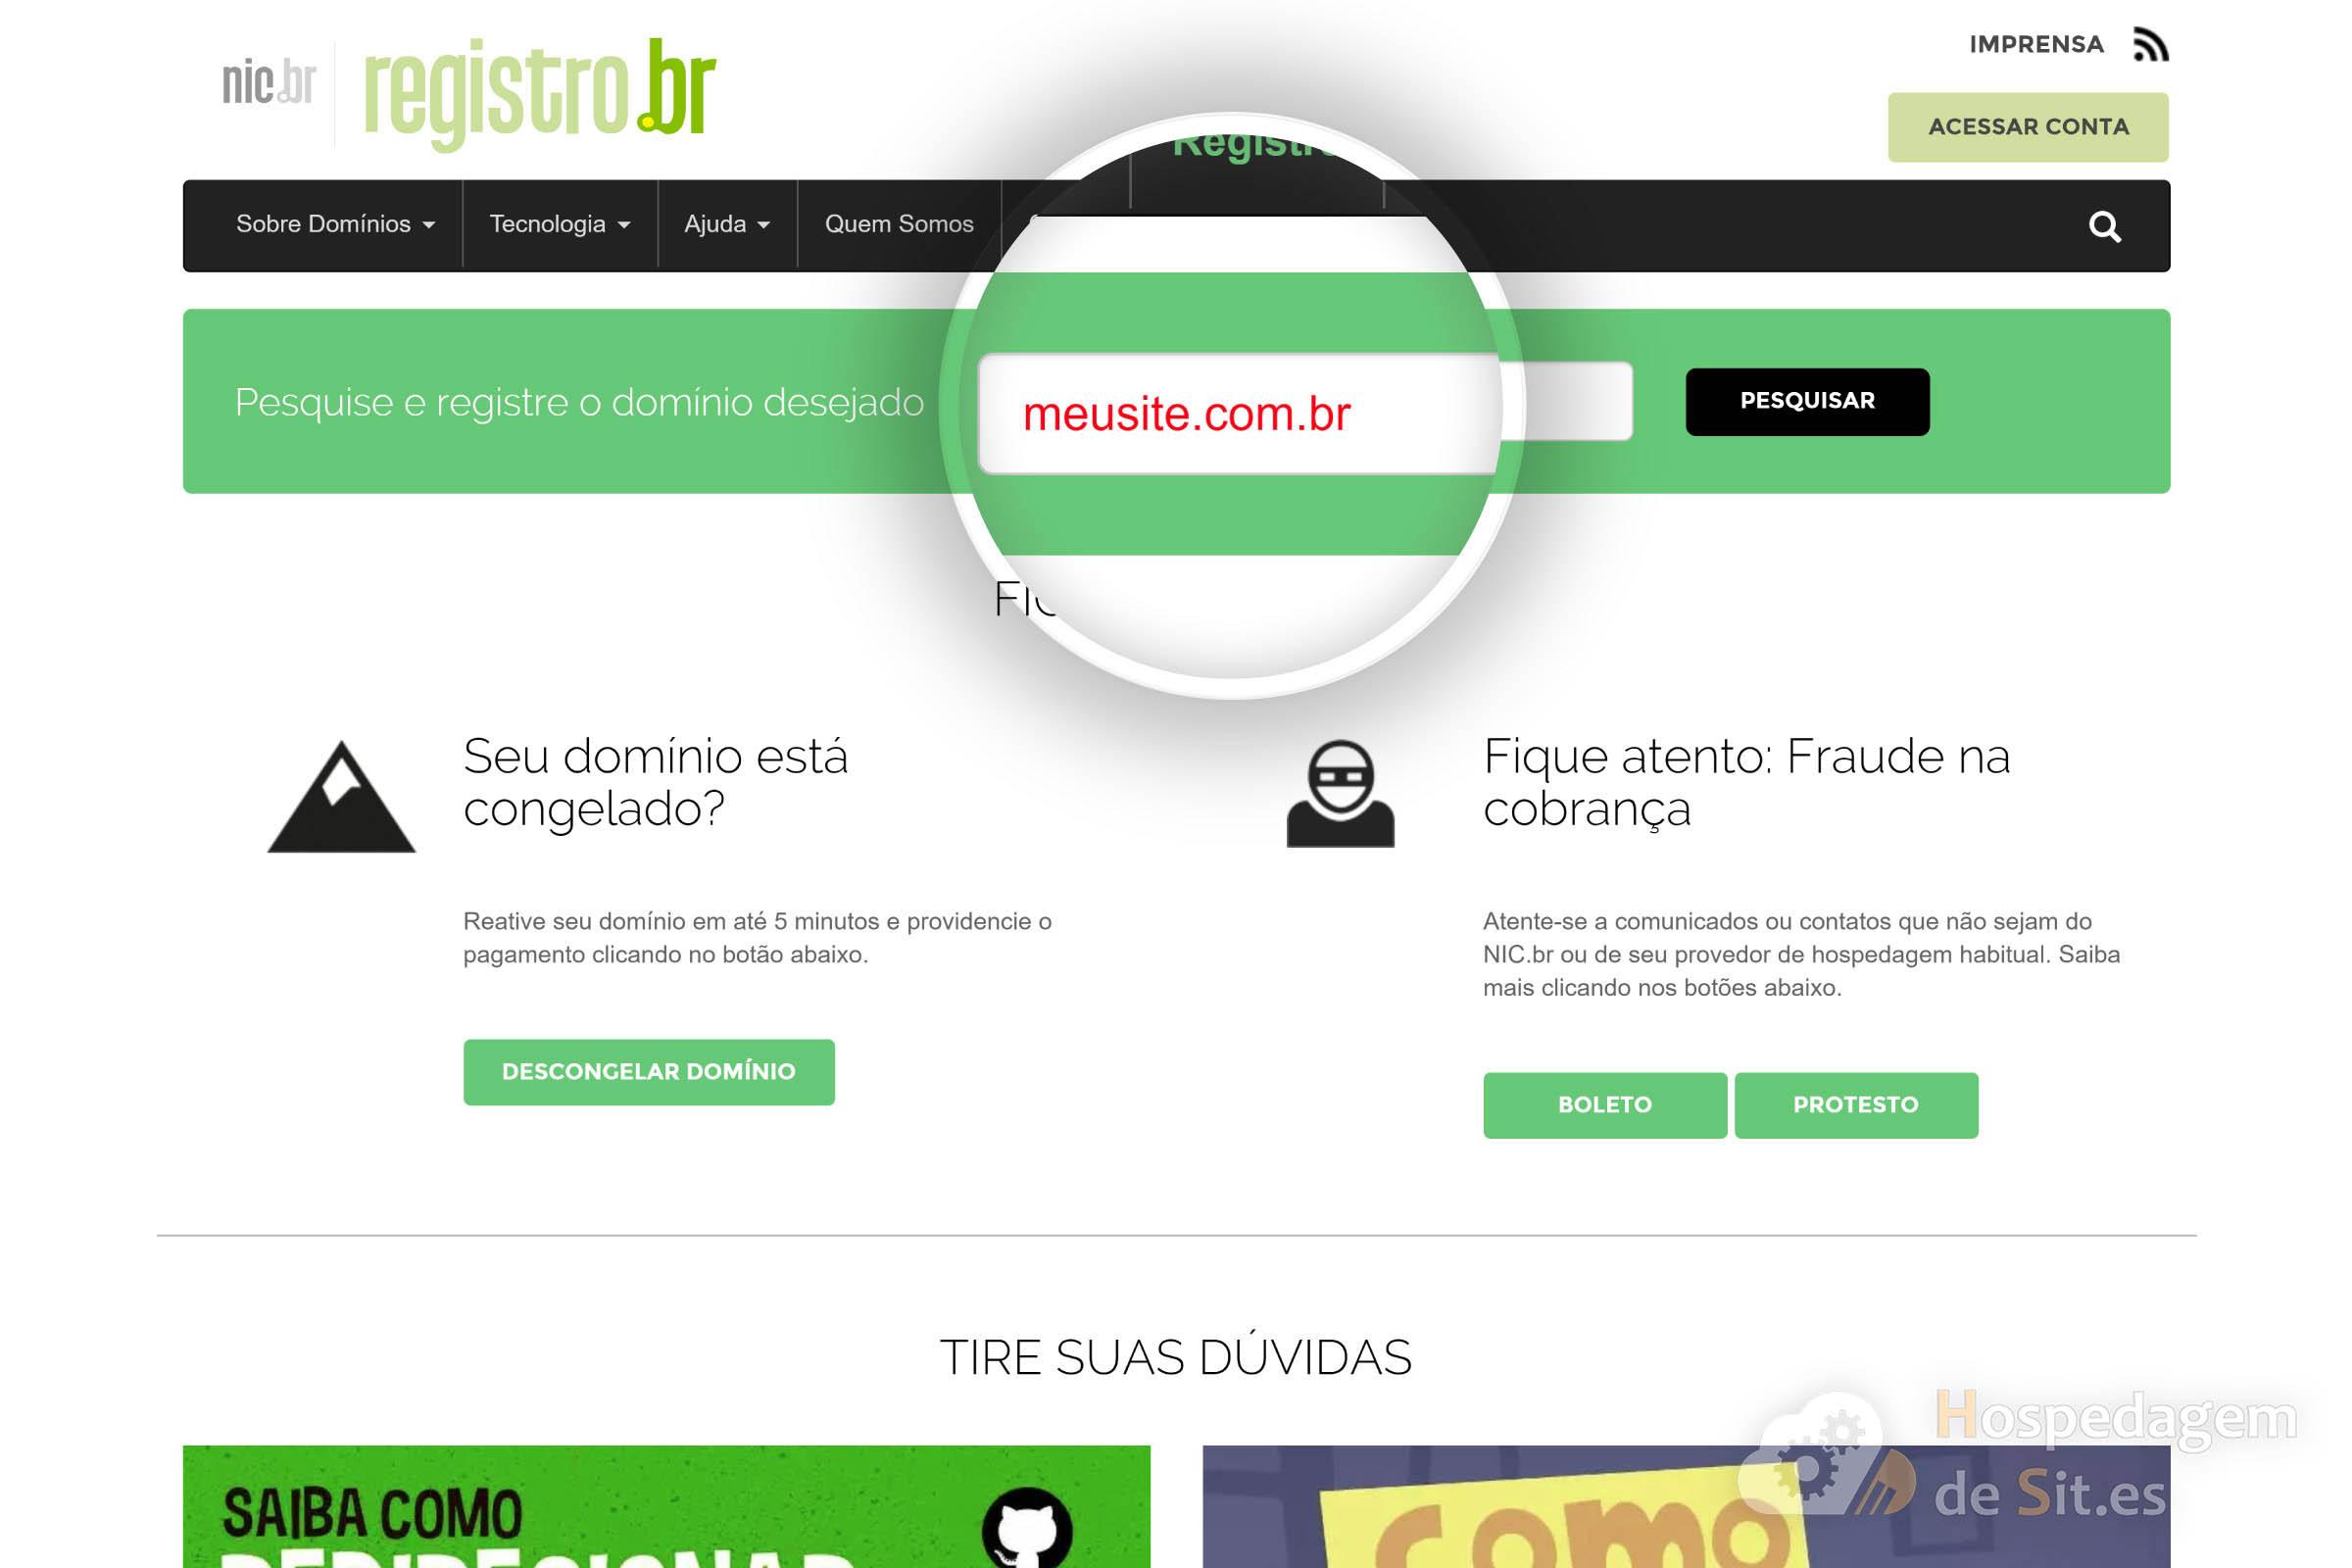 pesquisar disponibilidade de domínio registro br